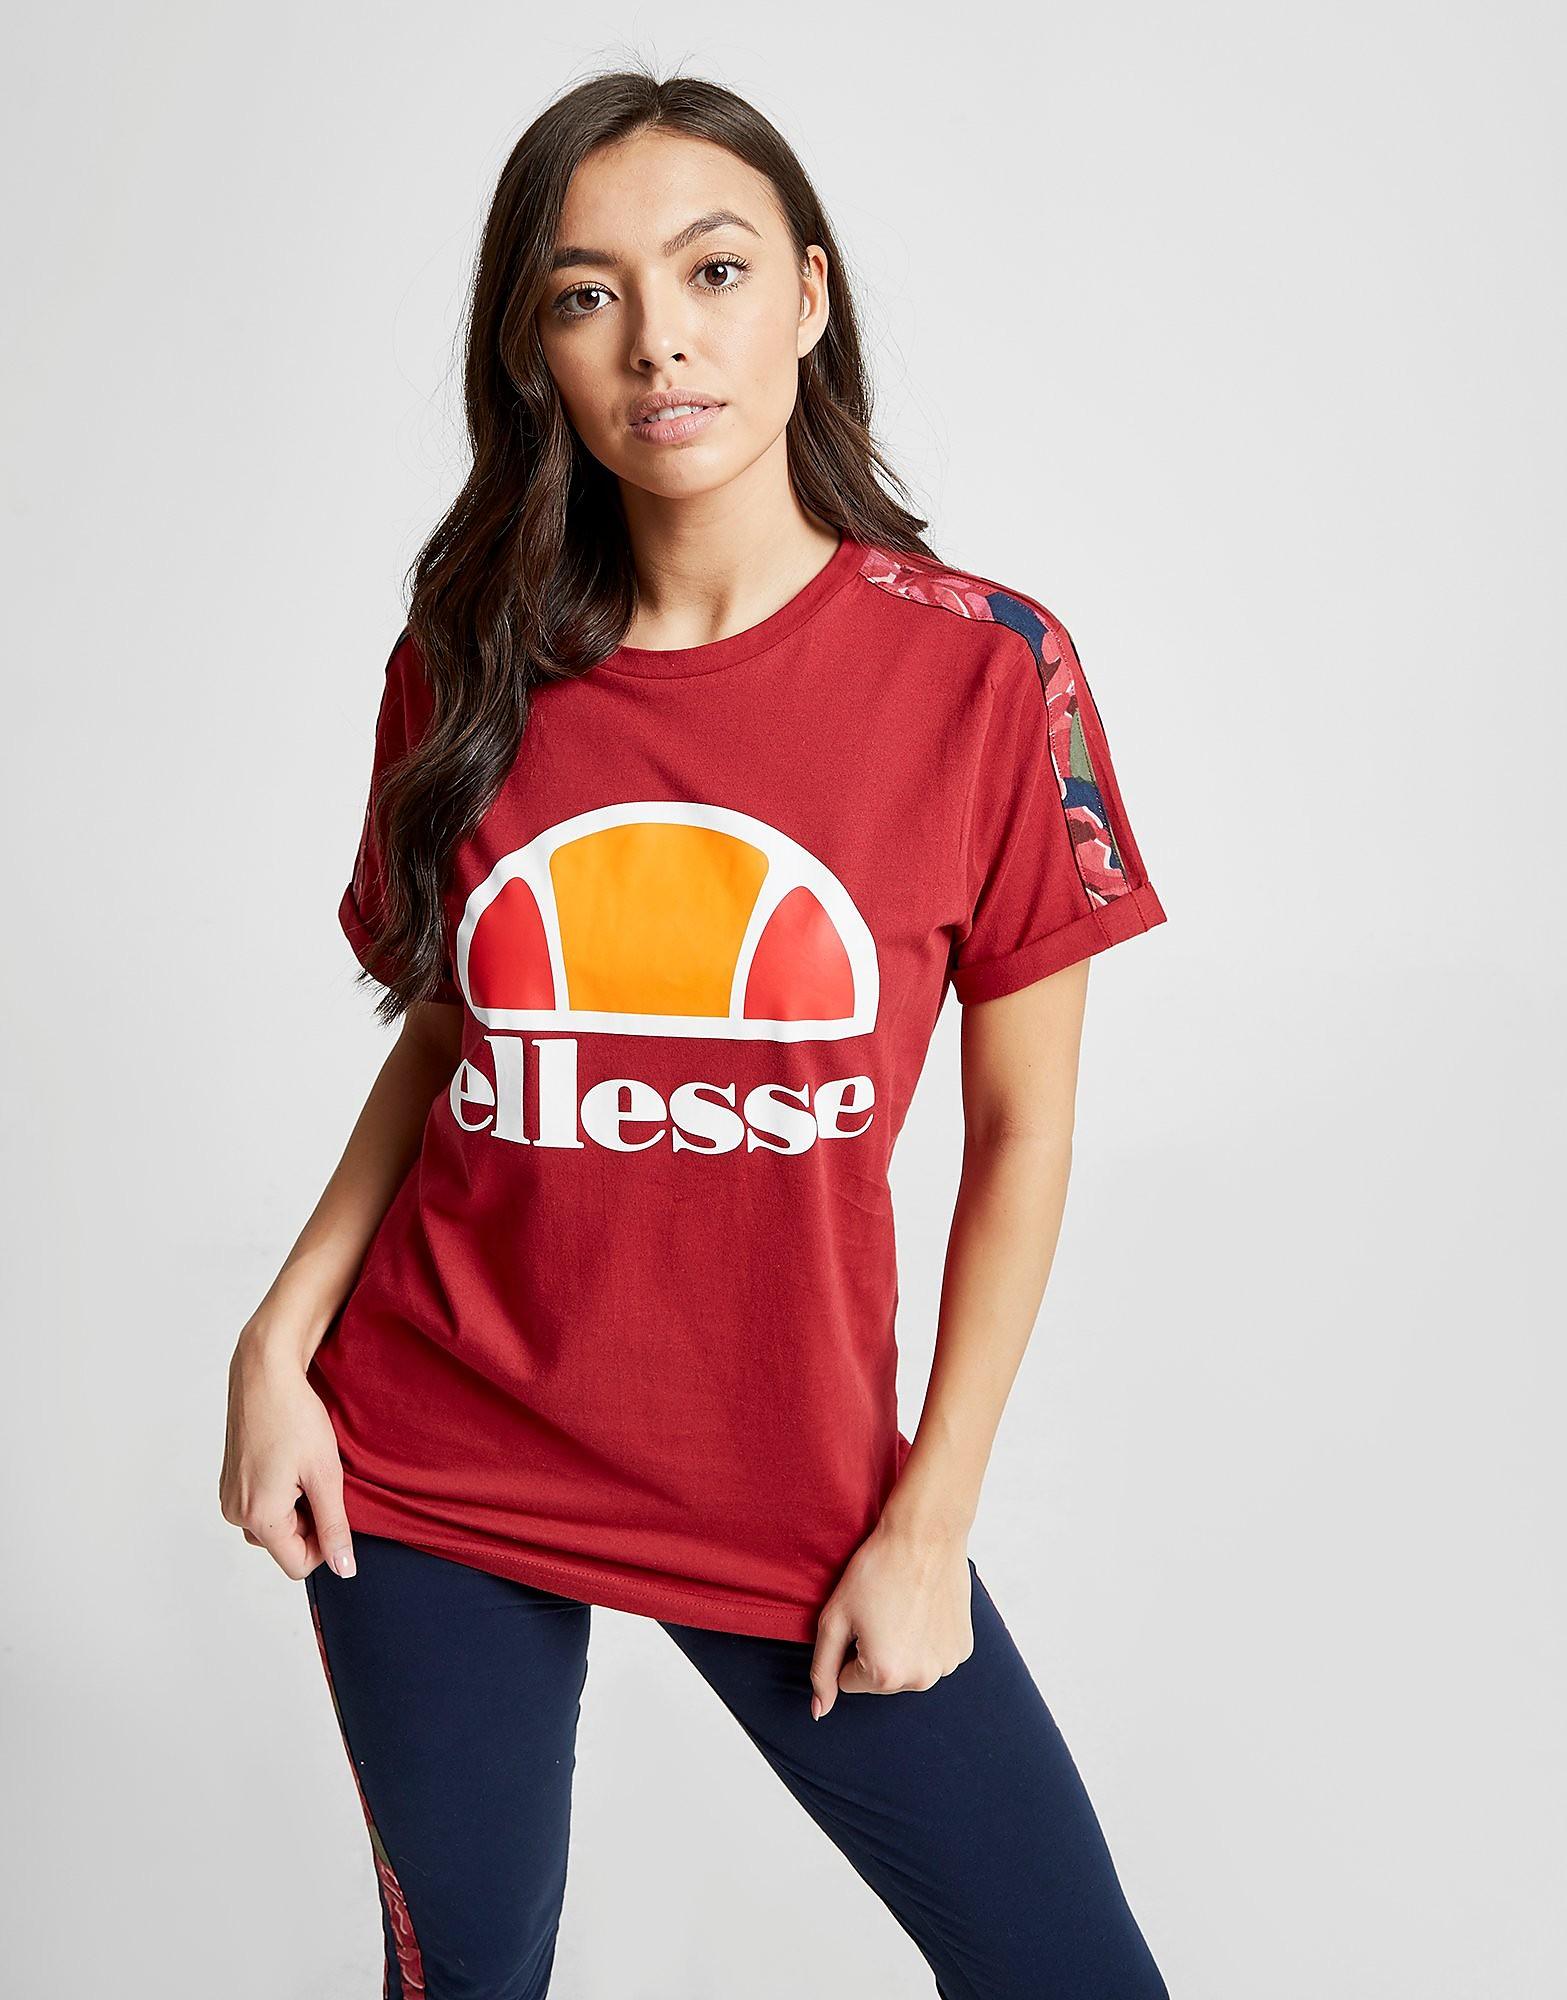 Women S Ellesse Clothing Accessories Jd Sports